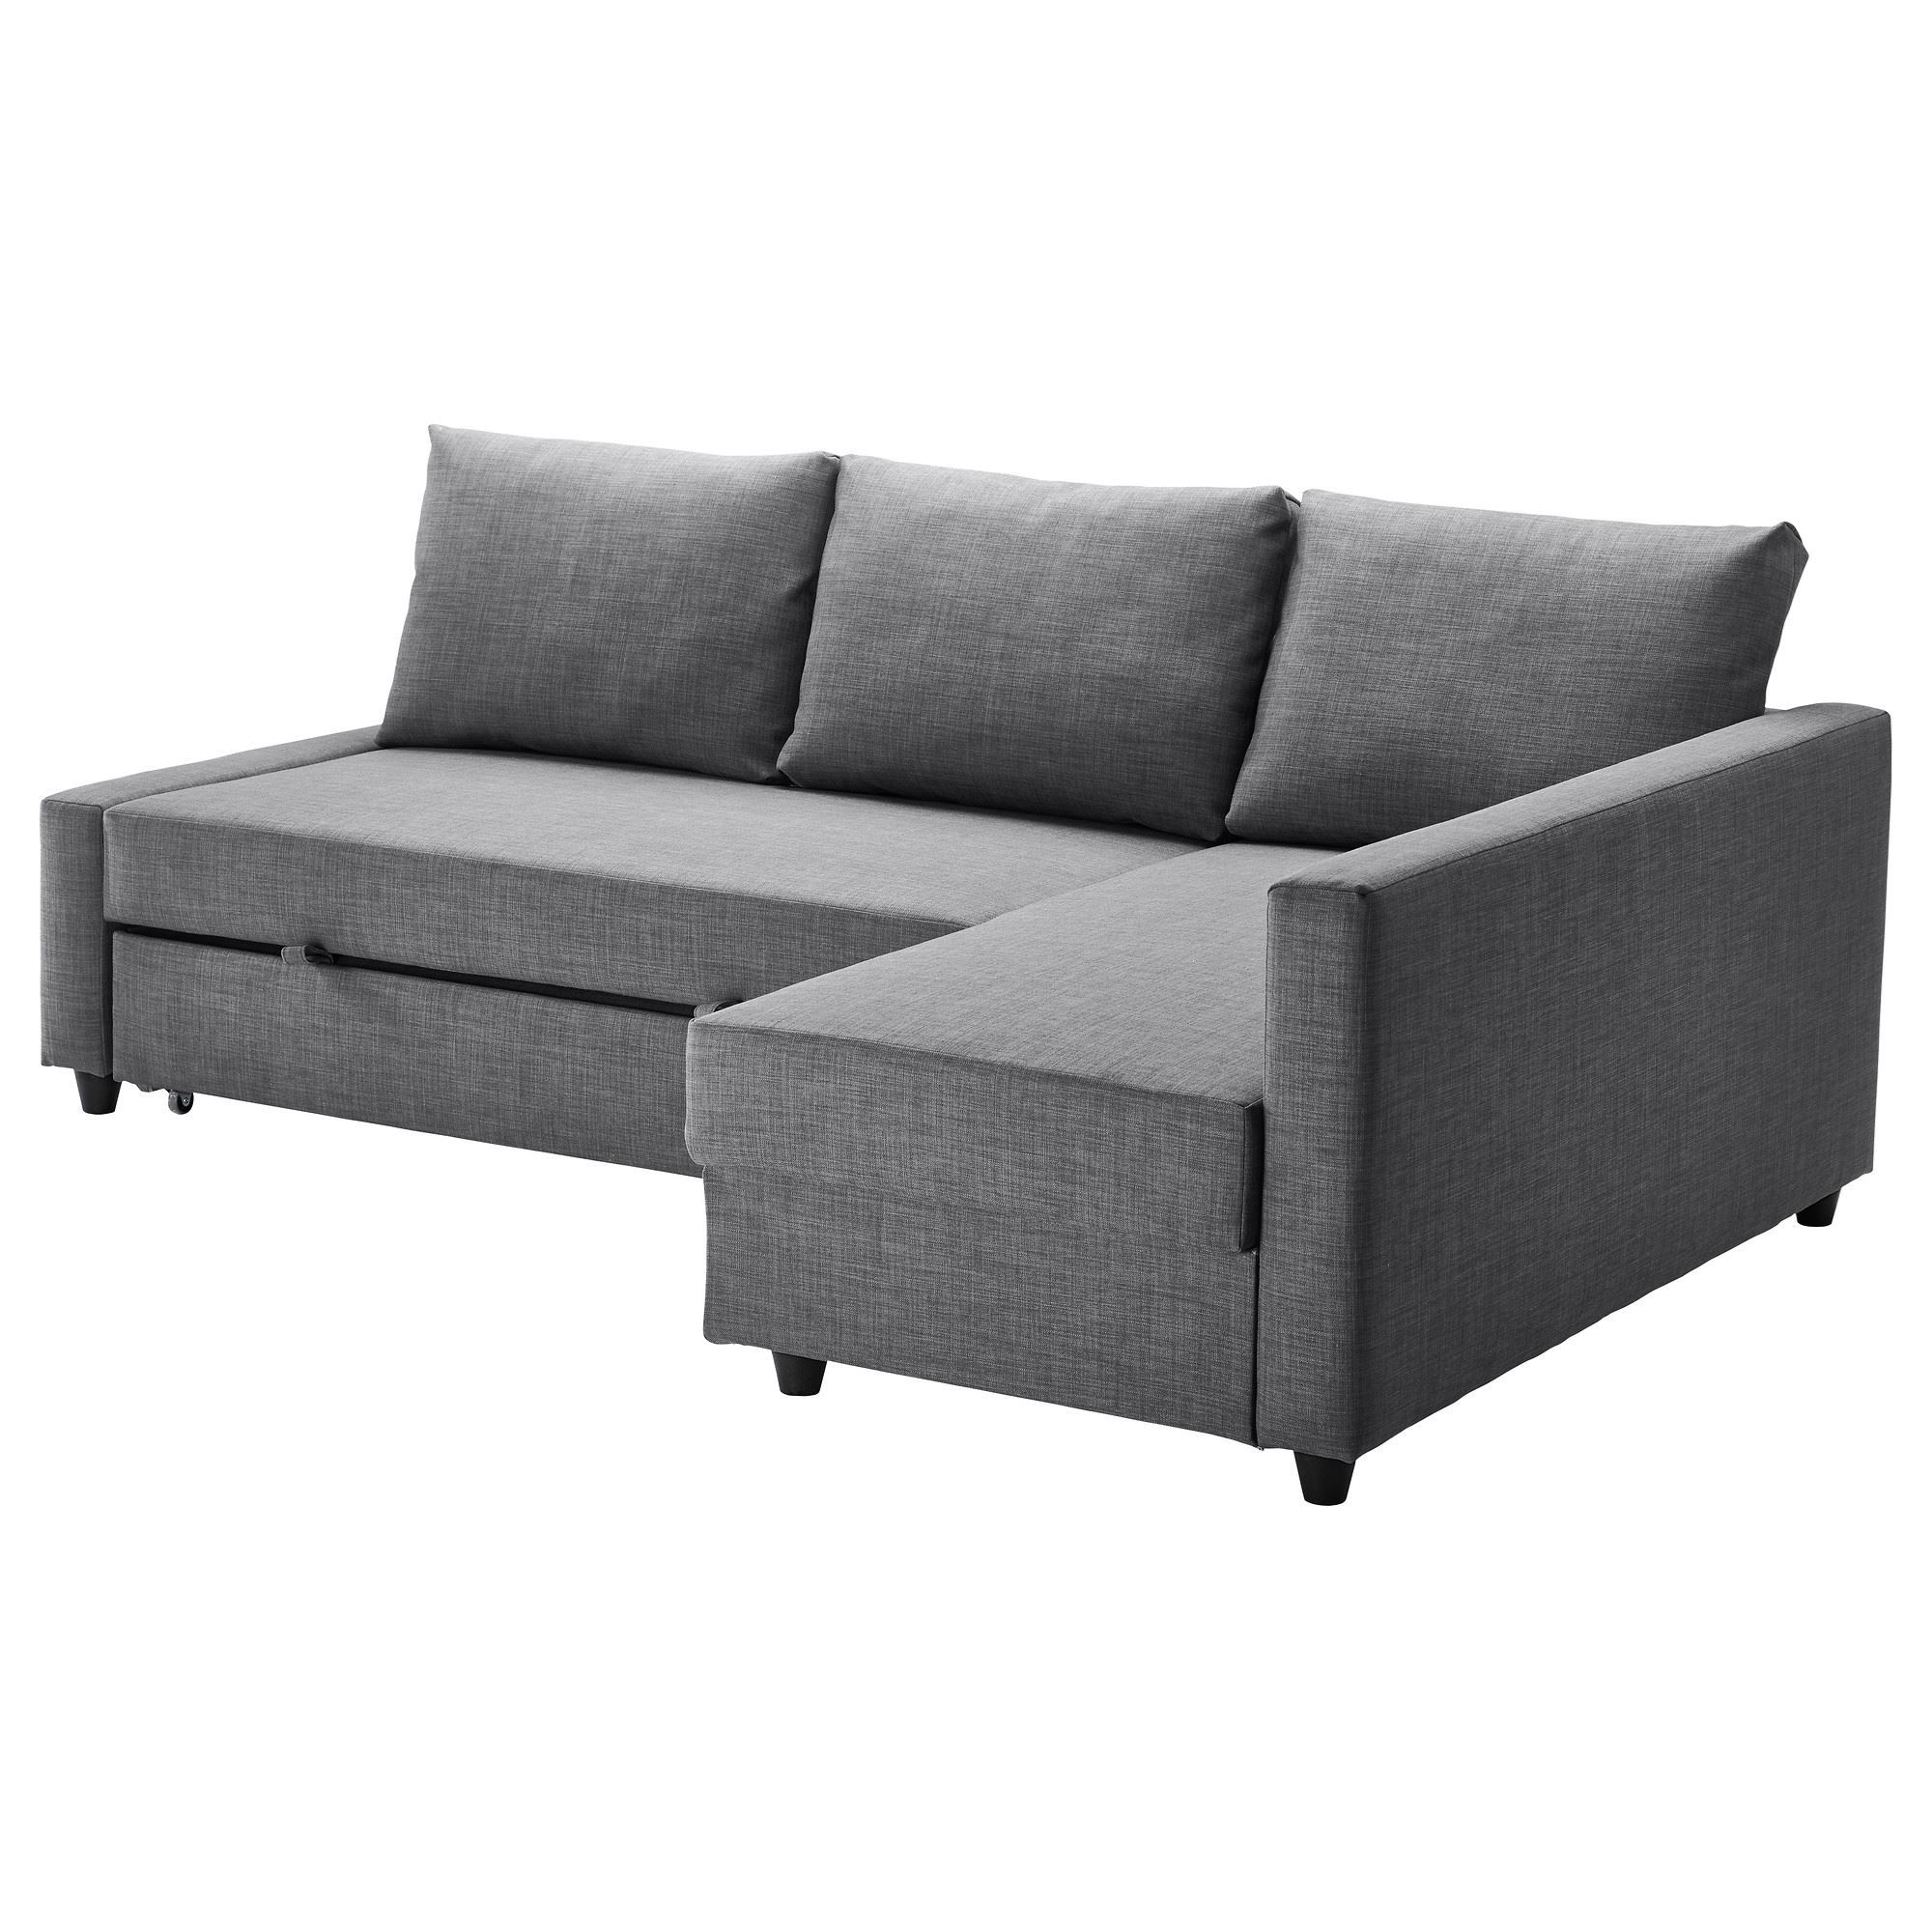 Ikea Koltuk